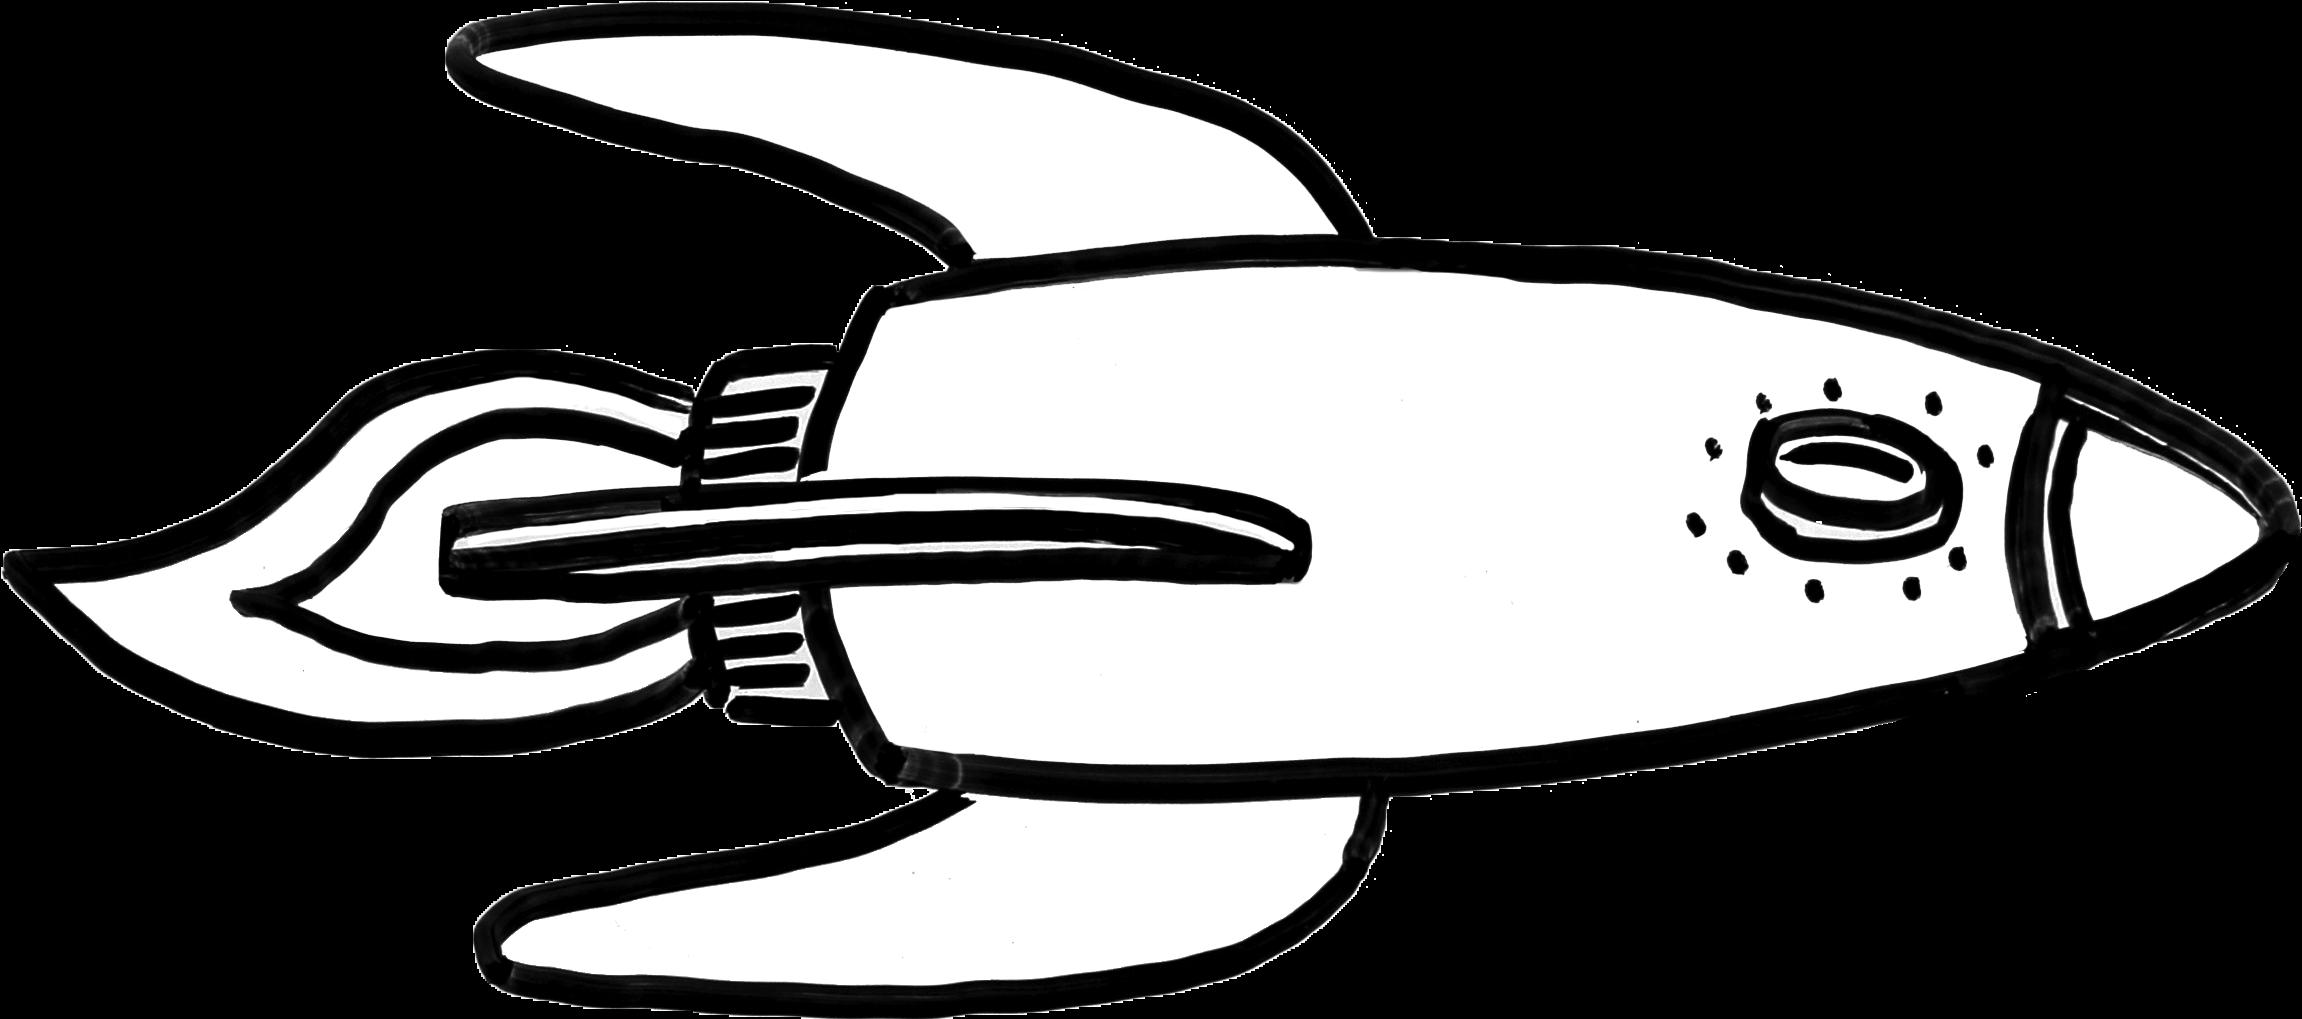 Download Hd Rocket Sketch Transparent Png Image Nicepng Com